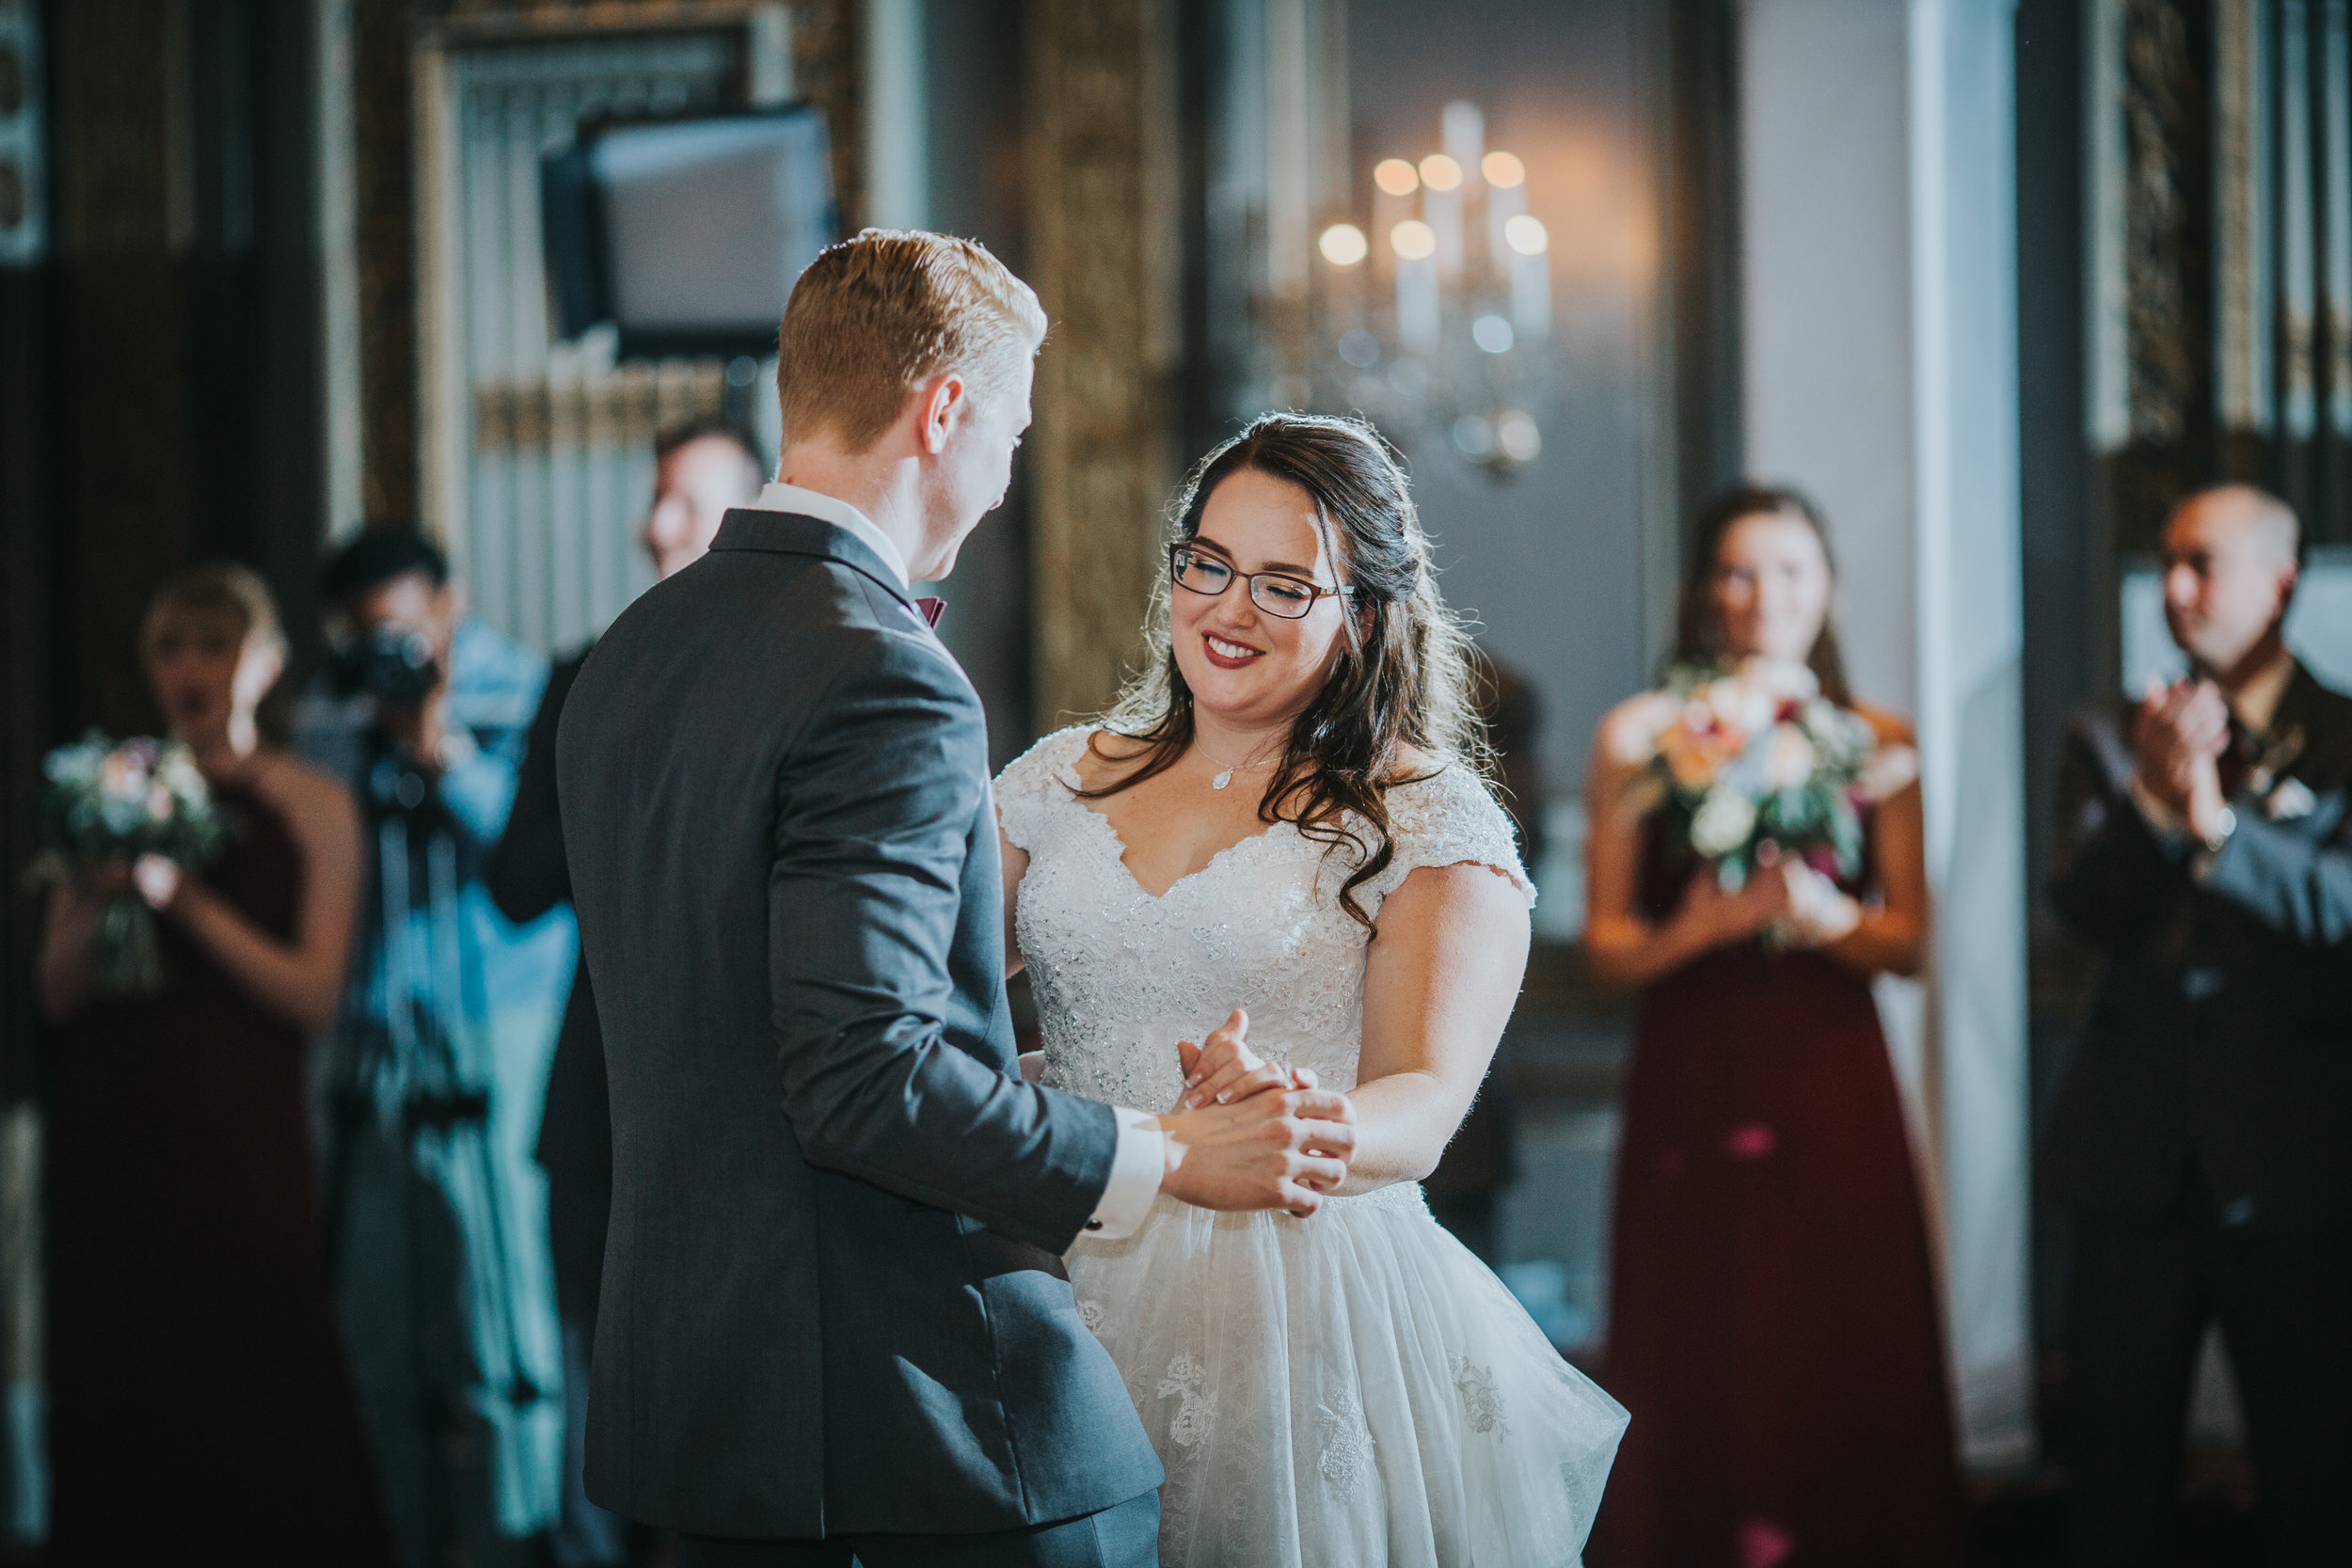 New-Jersey-Wedding-Photography-Fishers-Tudor-House-JennaLynnPhotography-Reception-Kathleen&Eddie-25.jpg